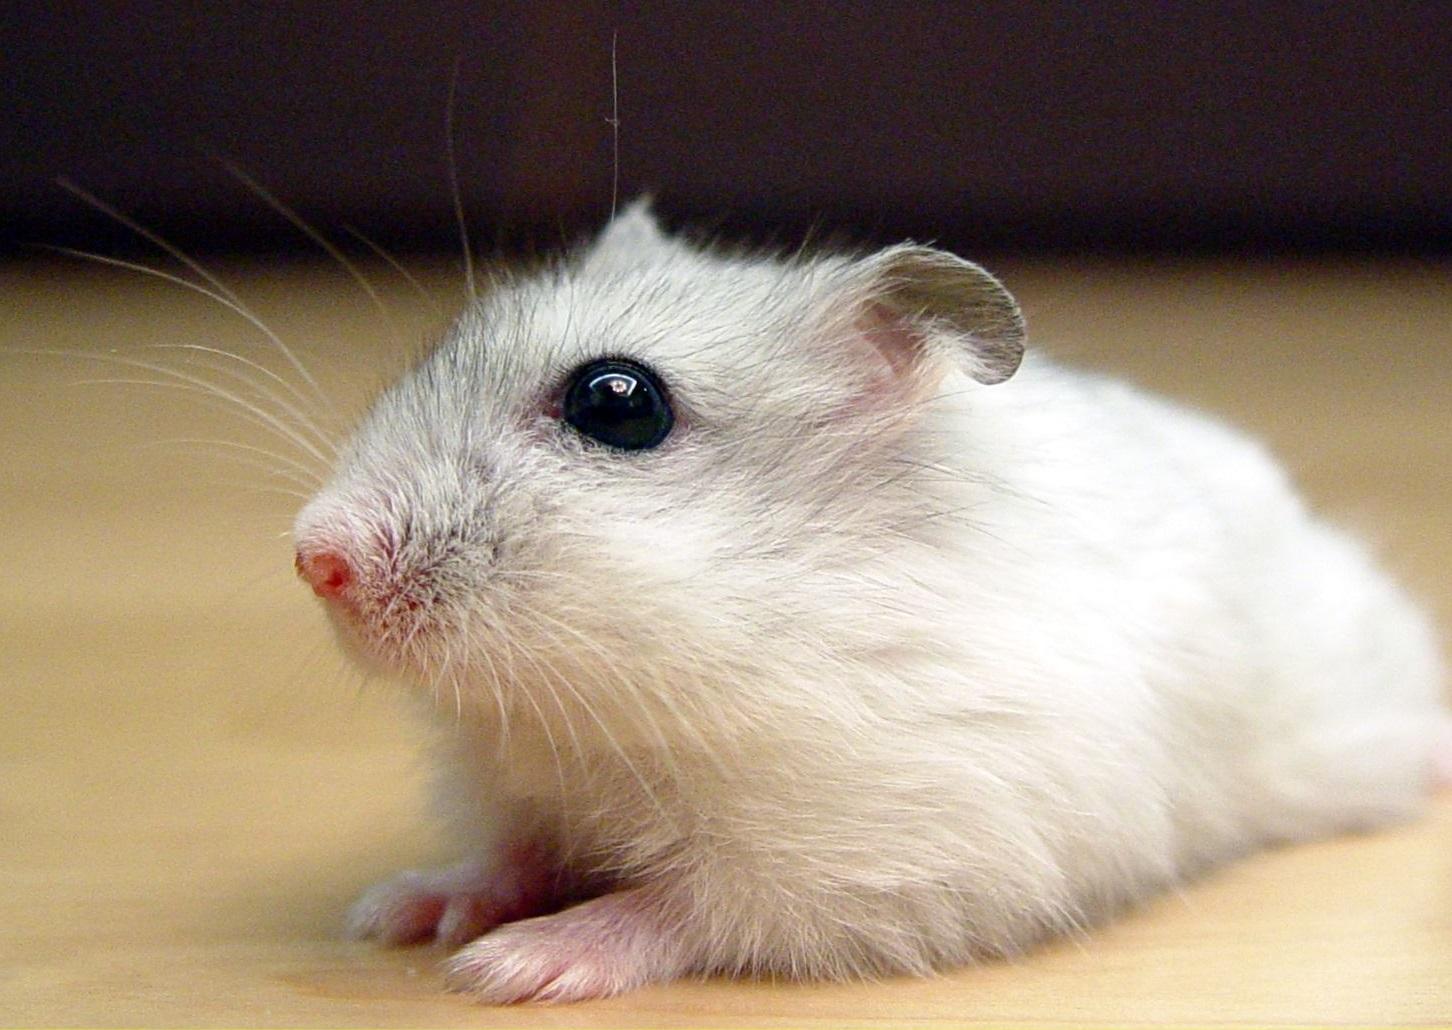 Djungarian hamster - Wikipedia